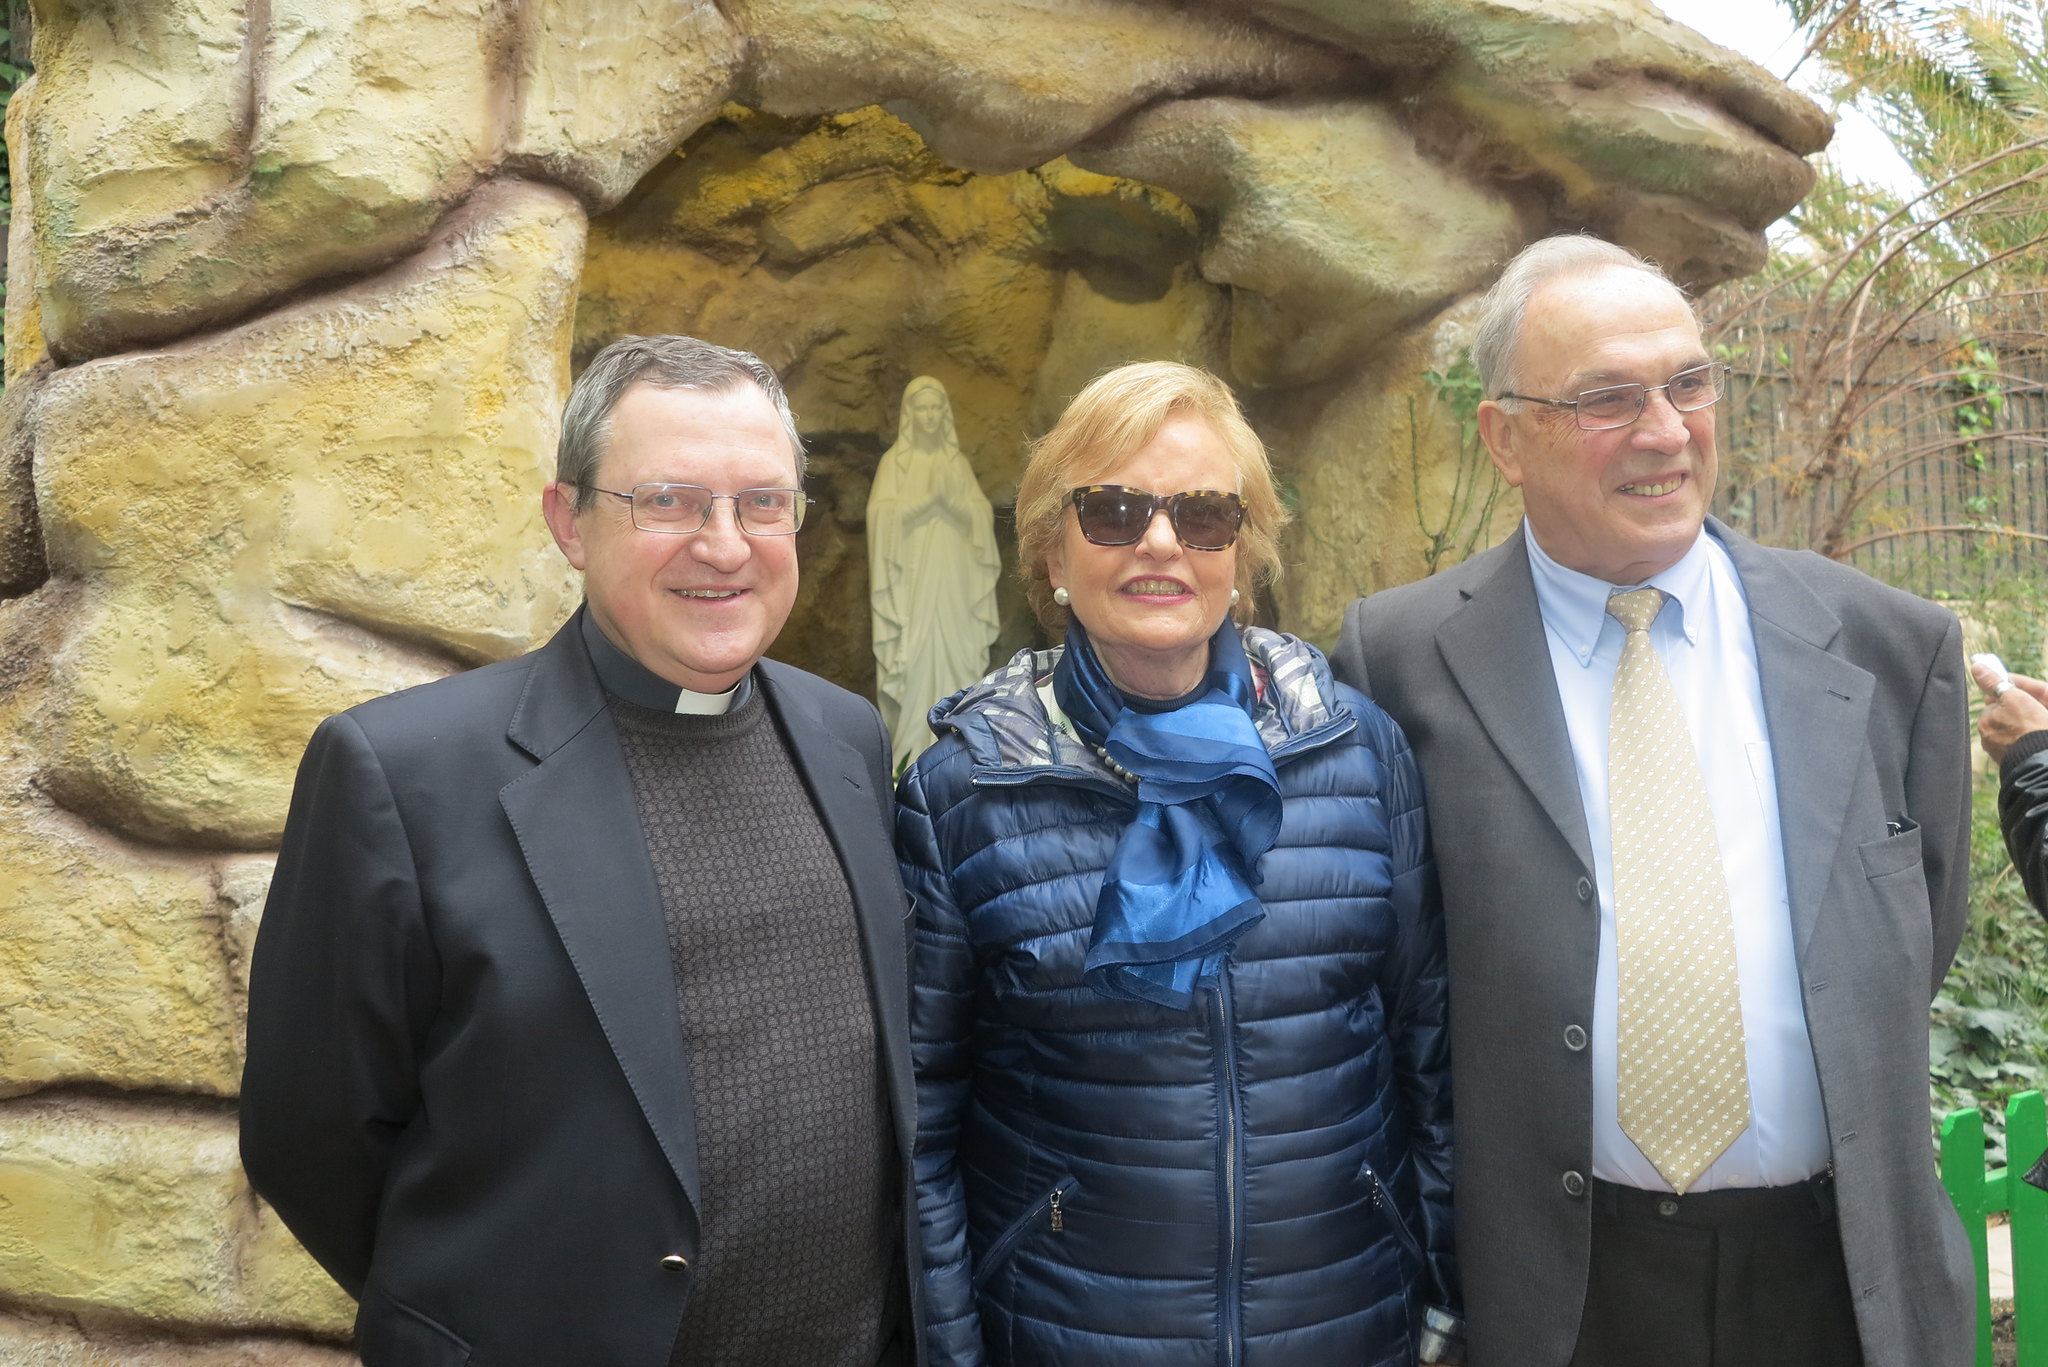 (2016-02-13) - Inauguración Virgen de Lourdes, La Molineta - Archivo La Molineta 2 (69)